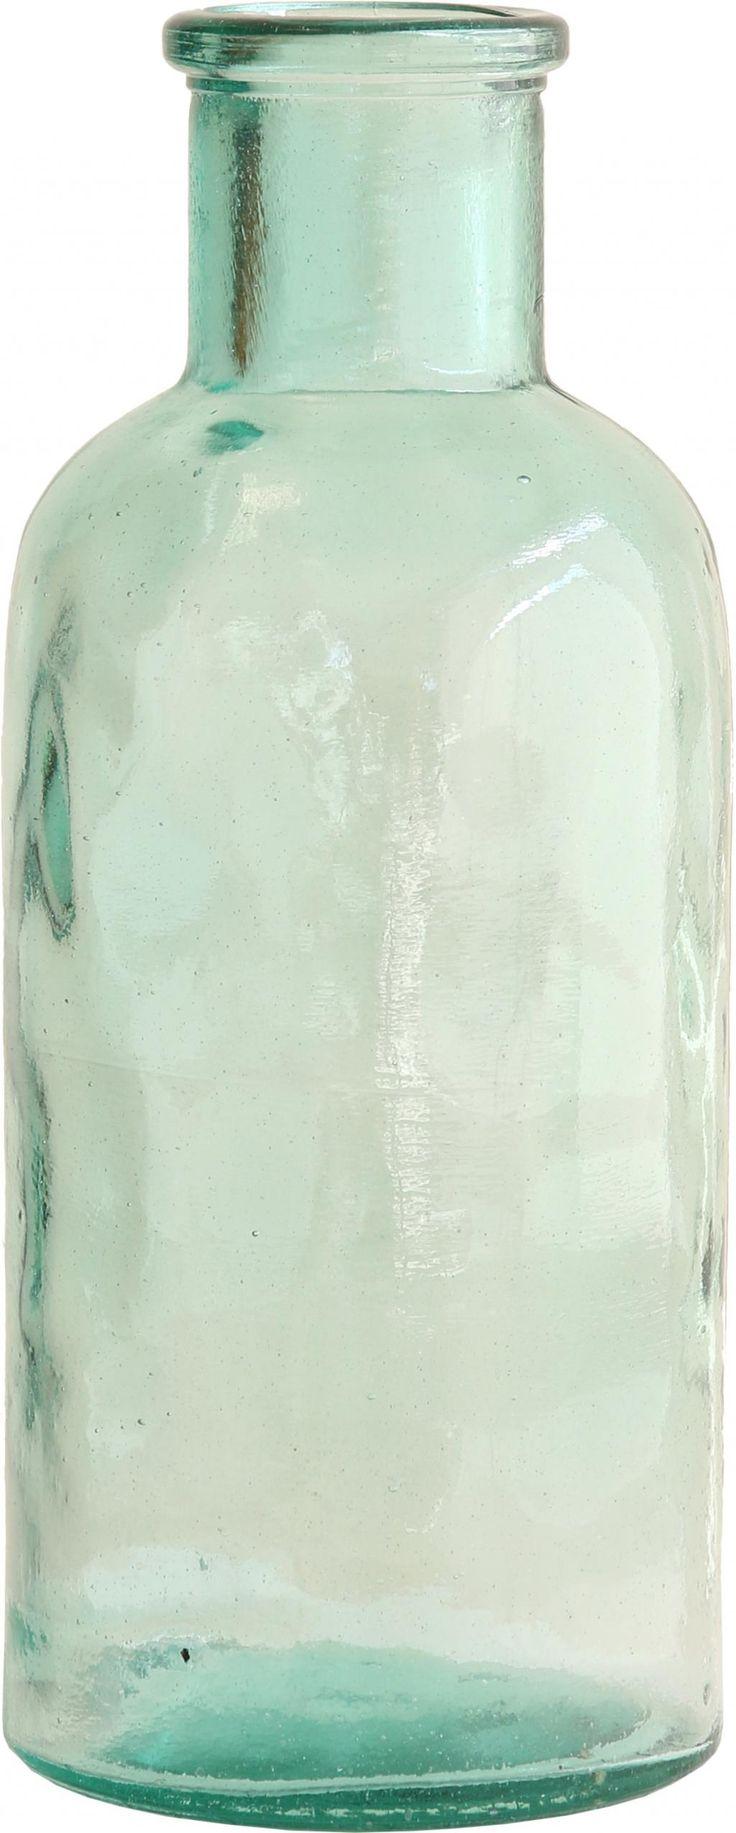 Bloemenvaas - glas - groen transparant - large - HK Living